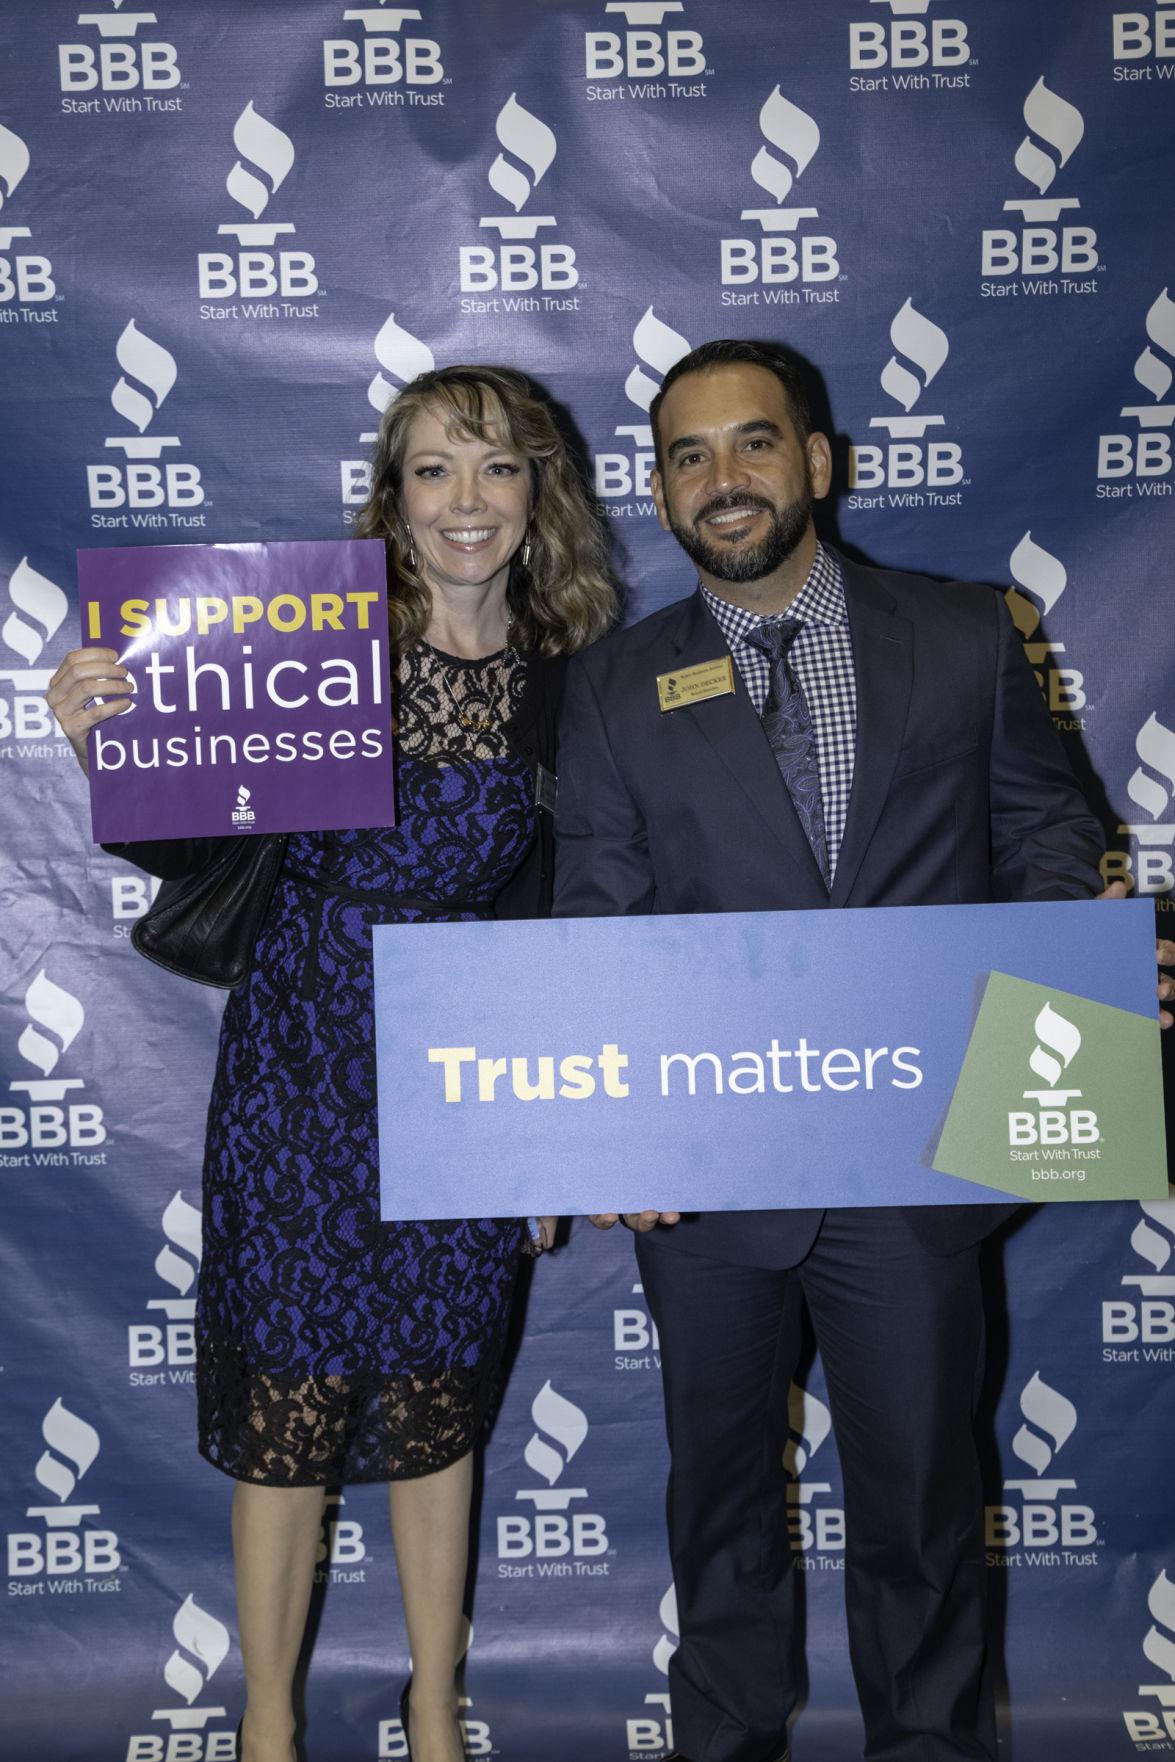 2019 BBB Torch Awards